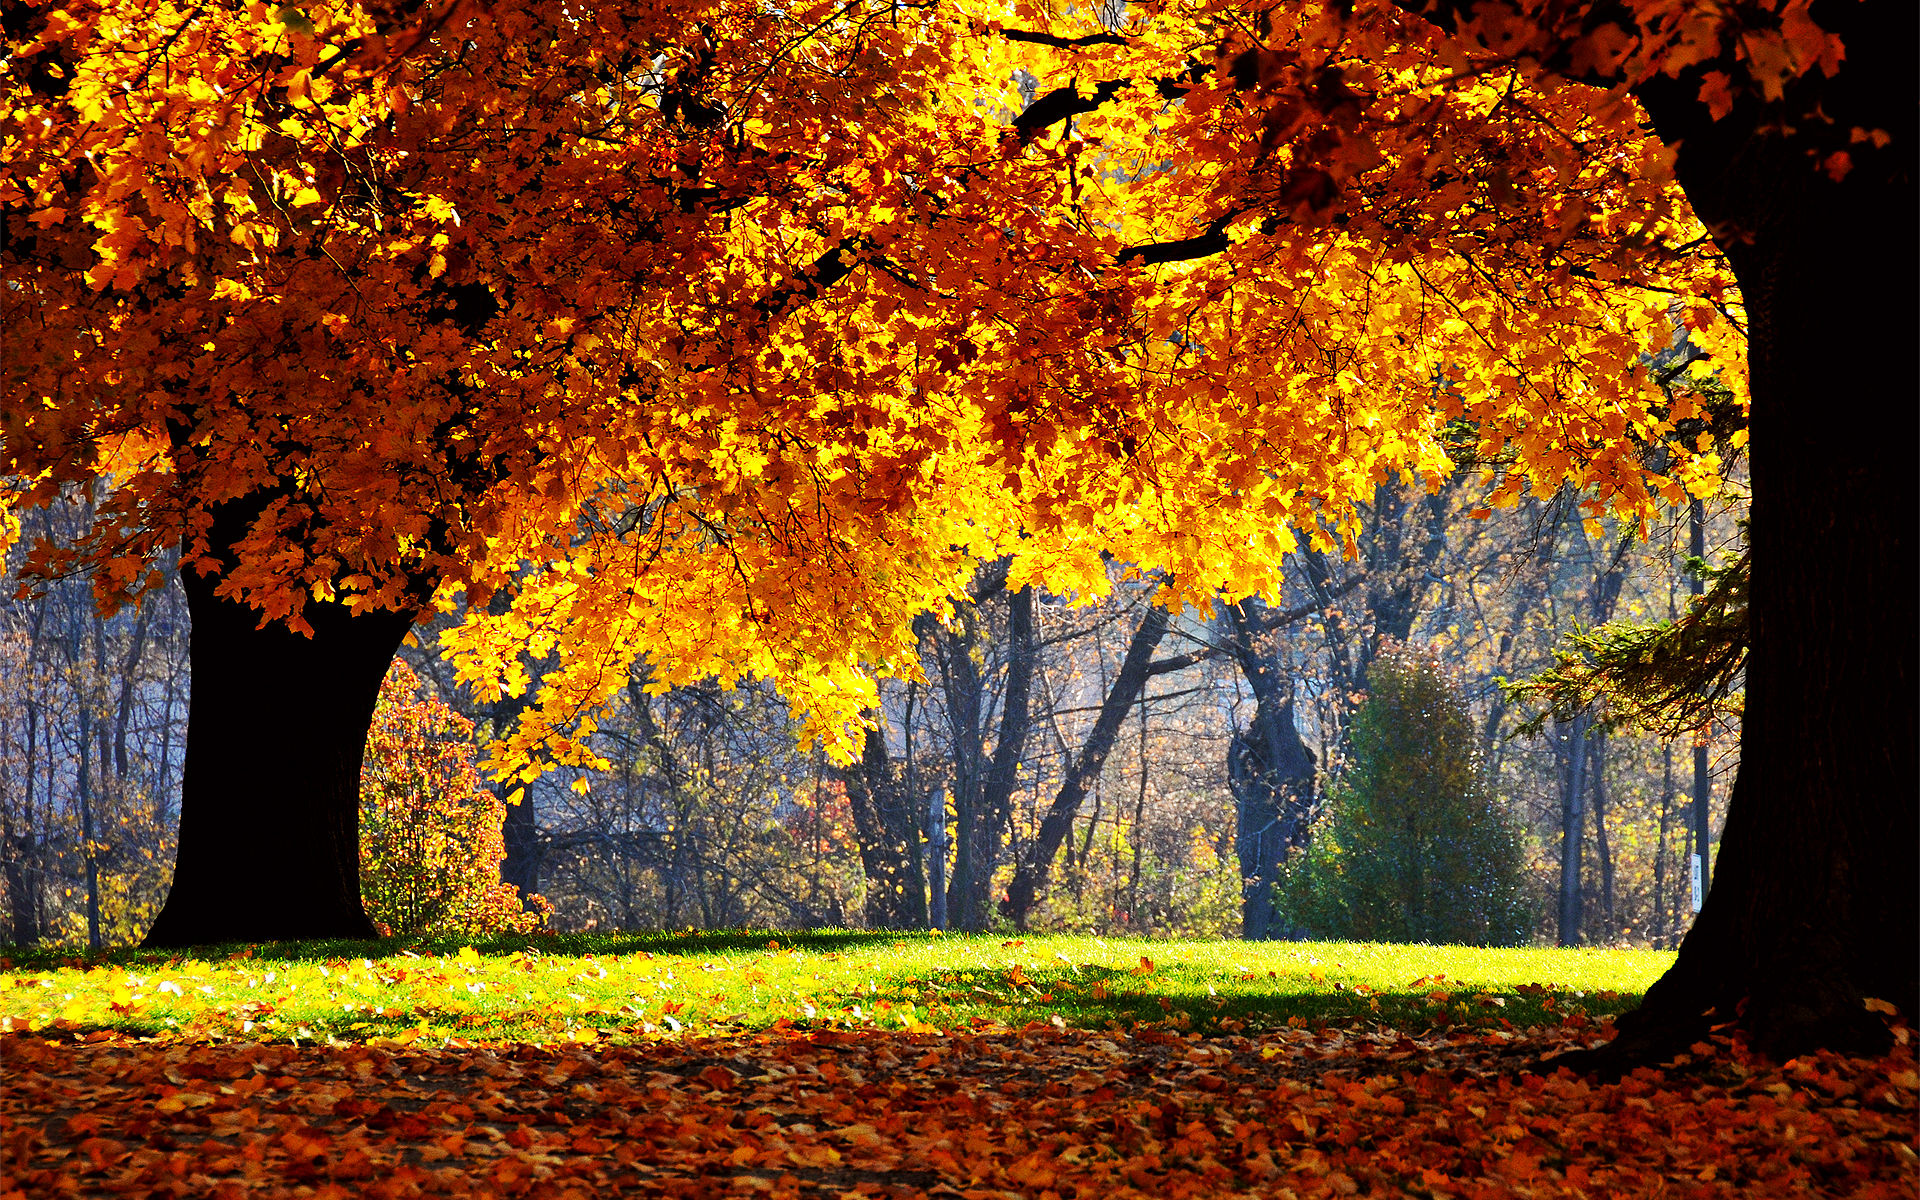 falls wallpapers autumn desktop wallpaper desktop 1920x1200 1920x1200